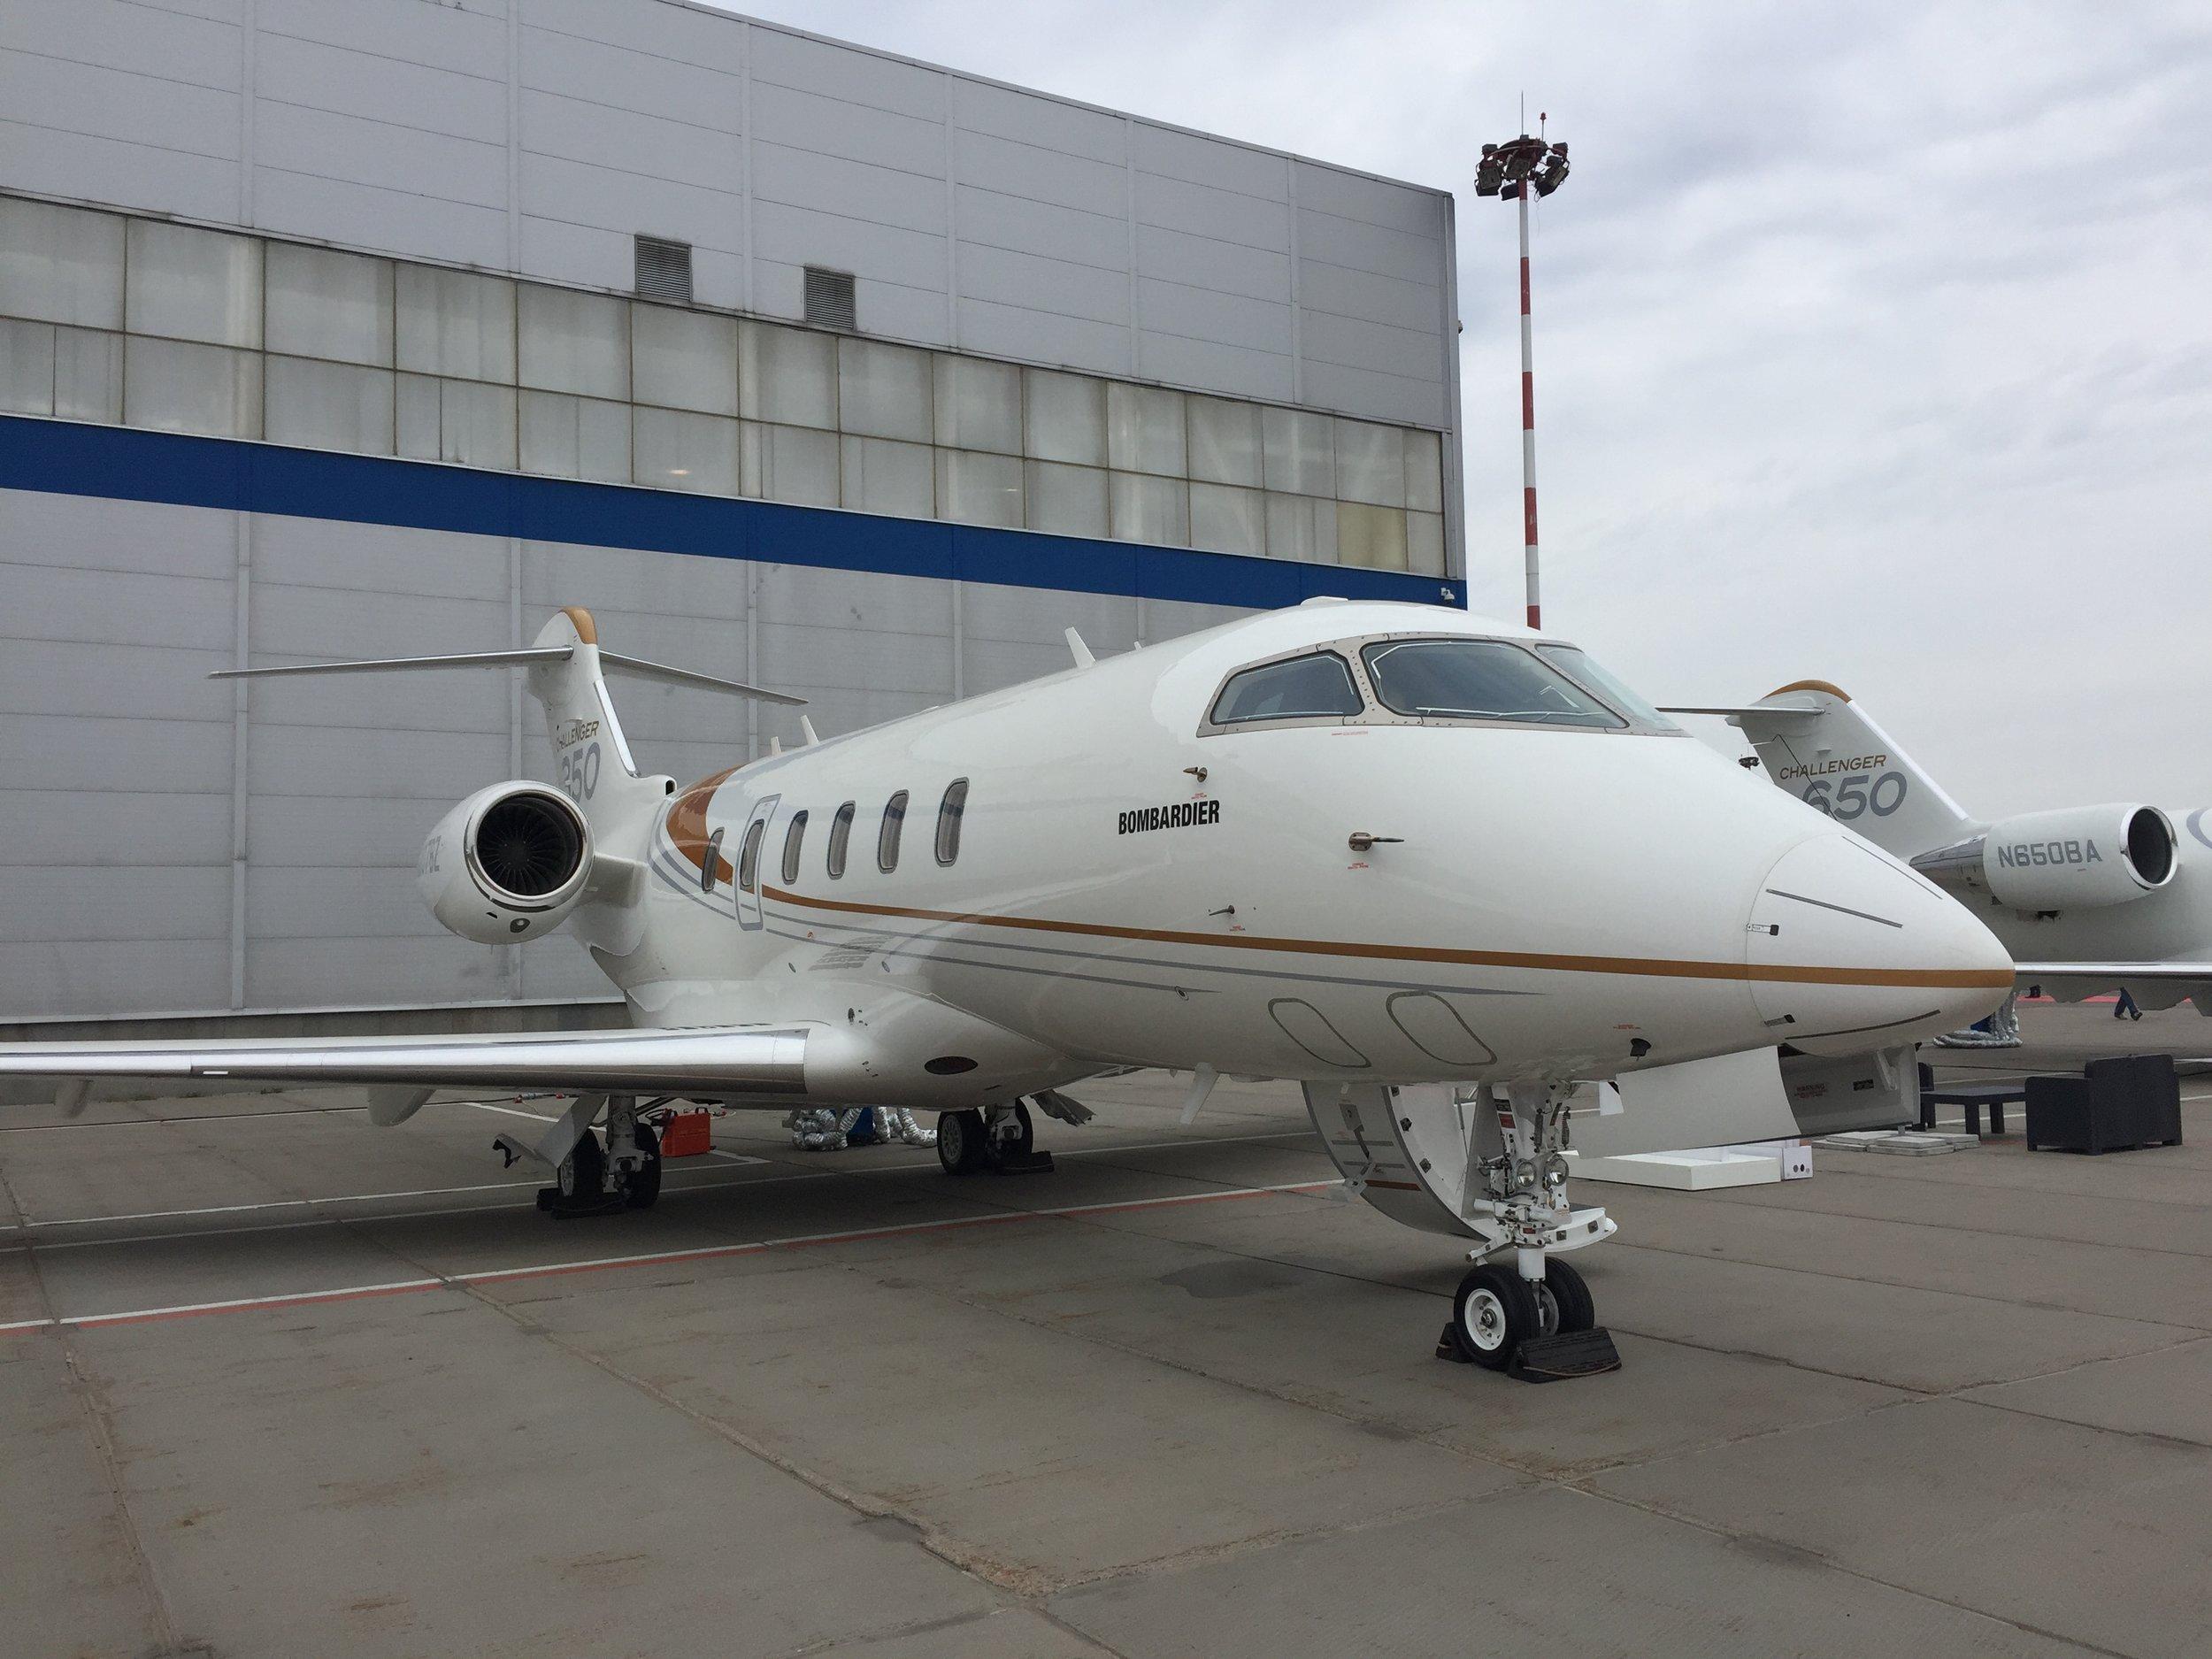 Bombardier Challenger 350 rubae.JPG